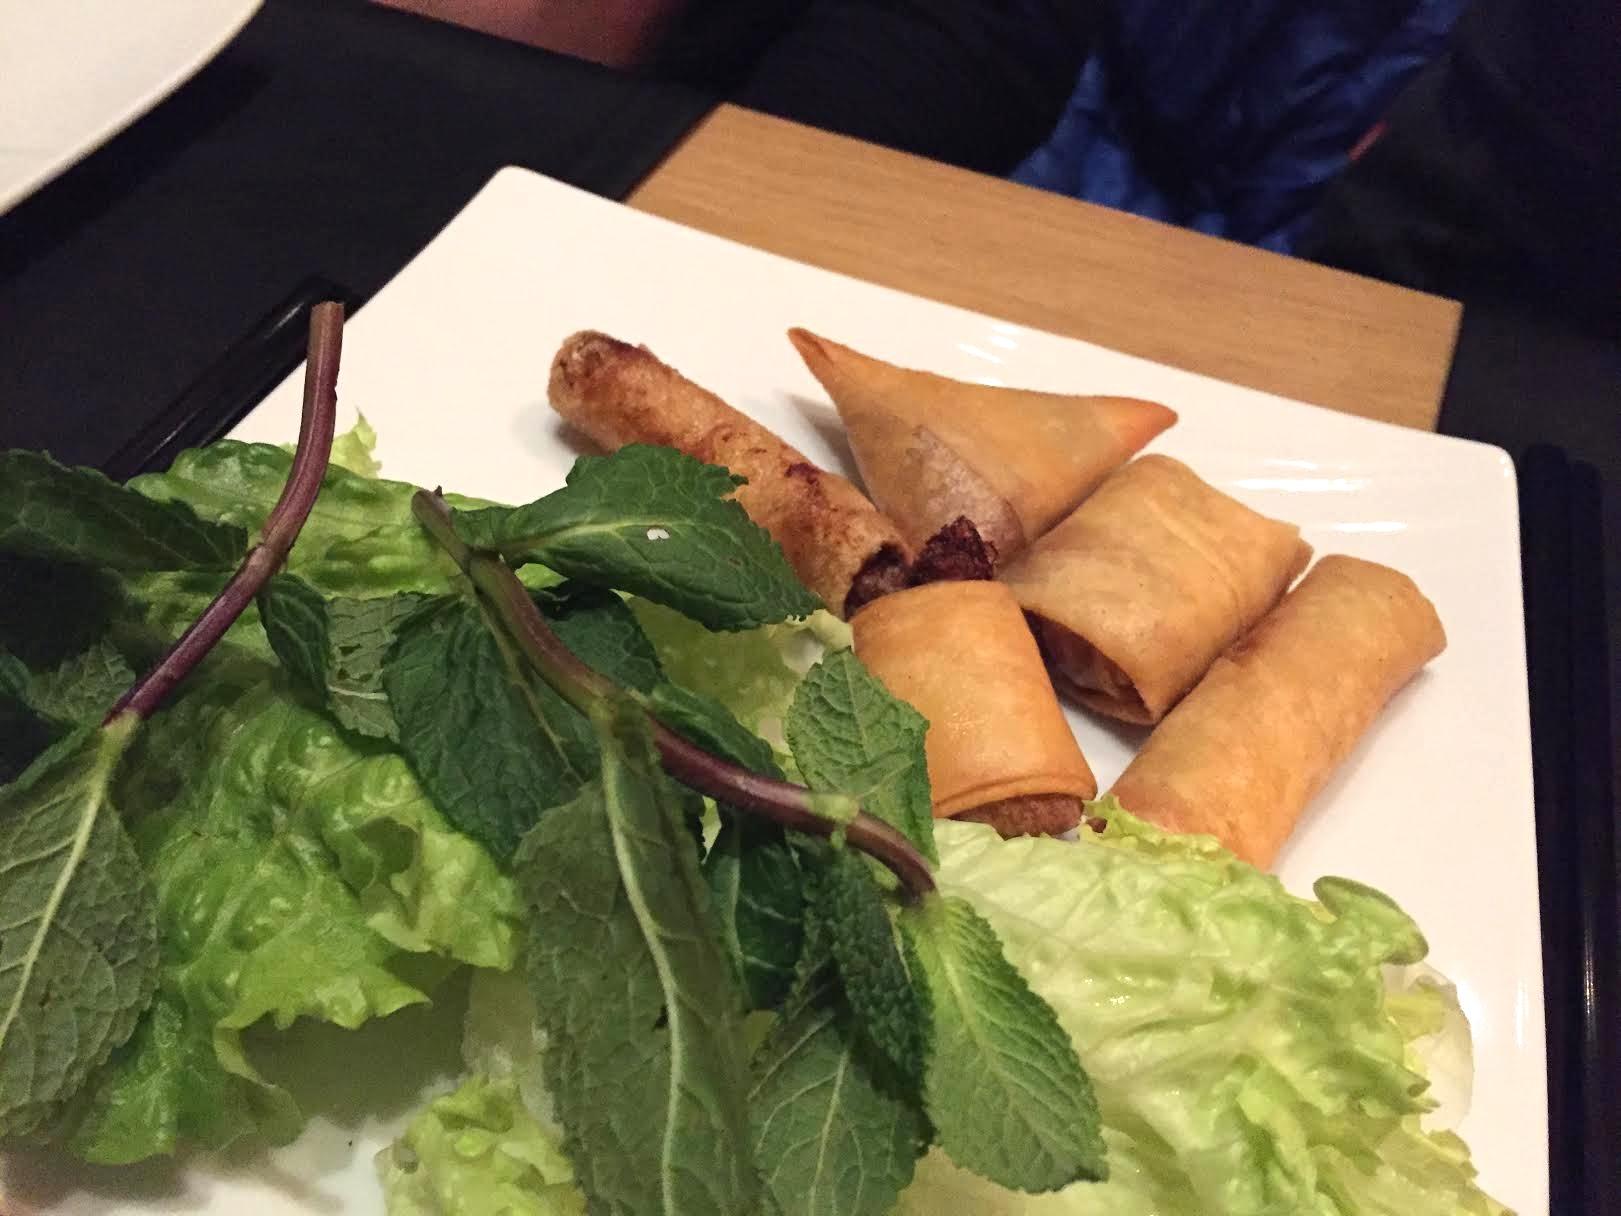 blog-mode-beaute-lifestyle-deco-cityguide-recette-voyage-strasbourg- restaurant